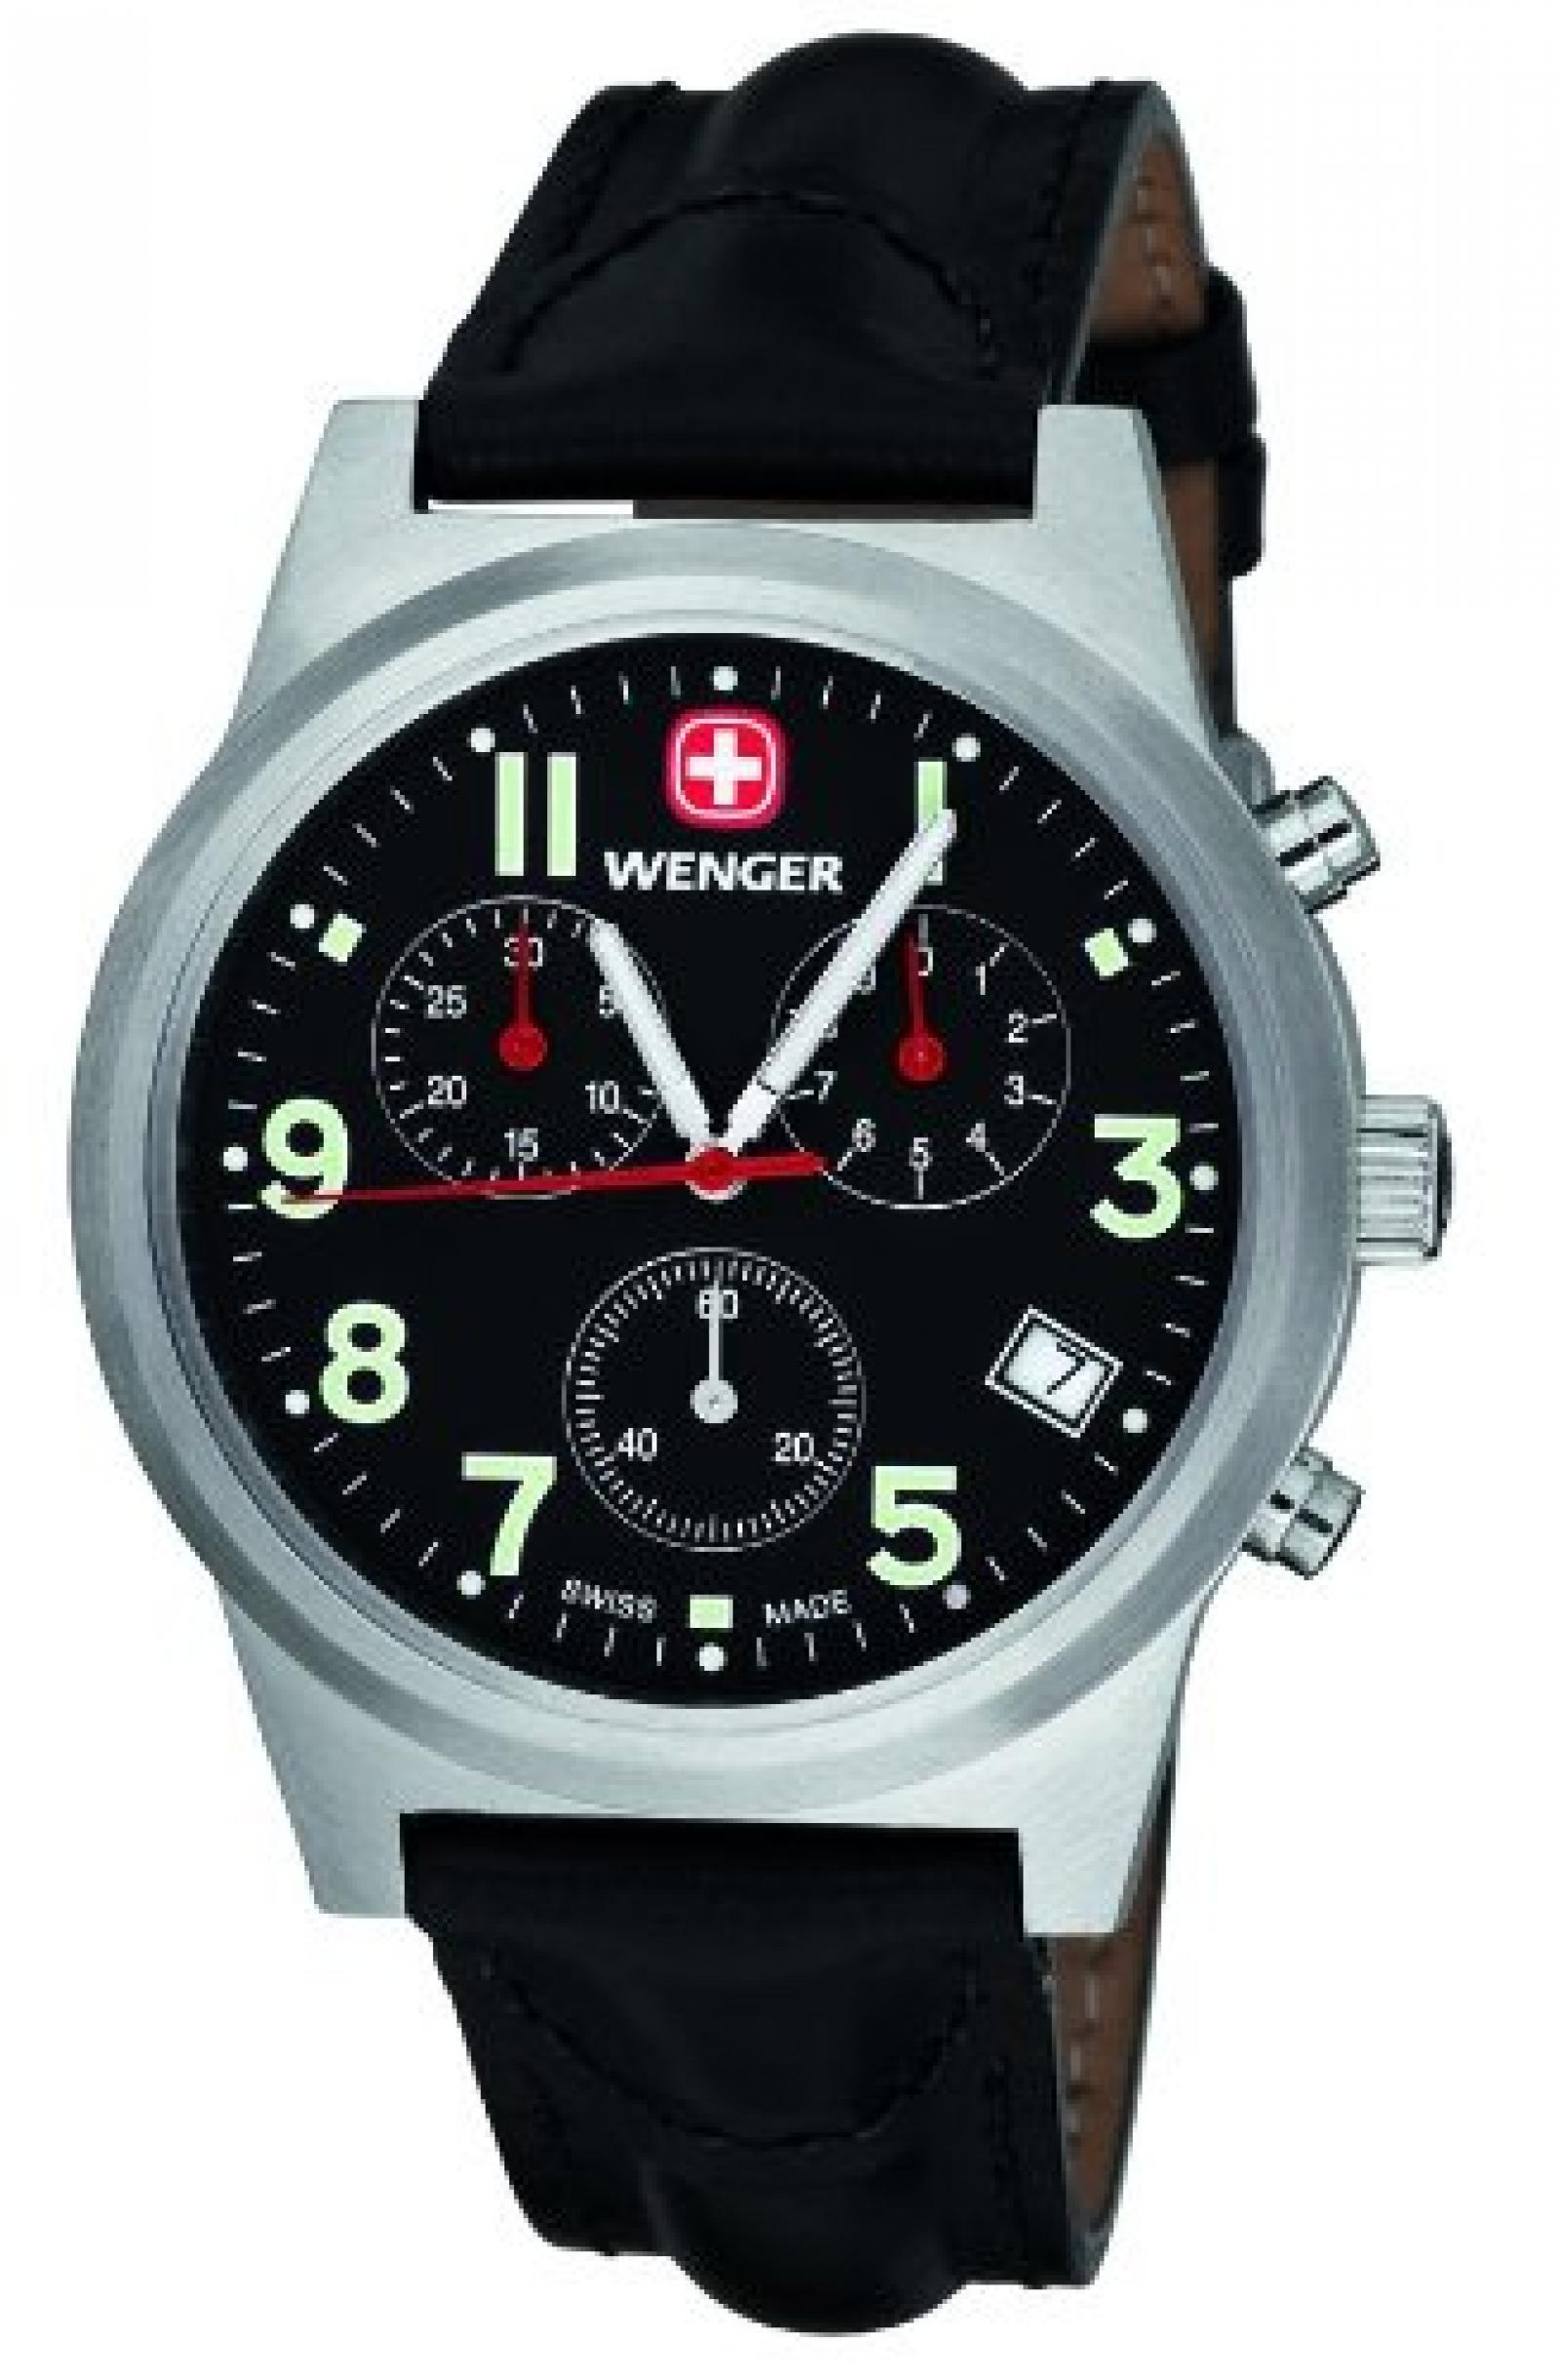 Wenger Herren-Armbanduhr Analog Edelstahl schwarz 72955W.XL